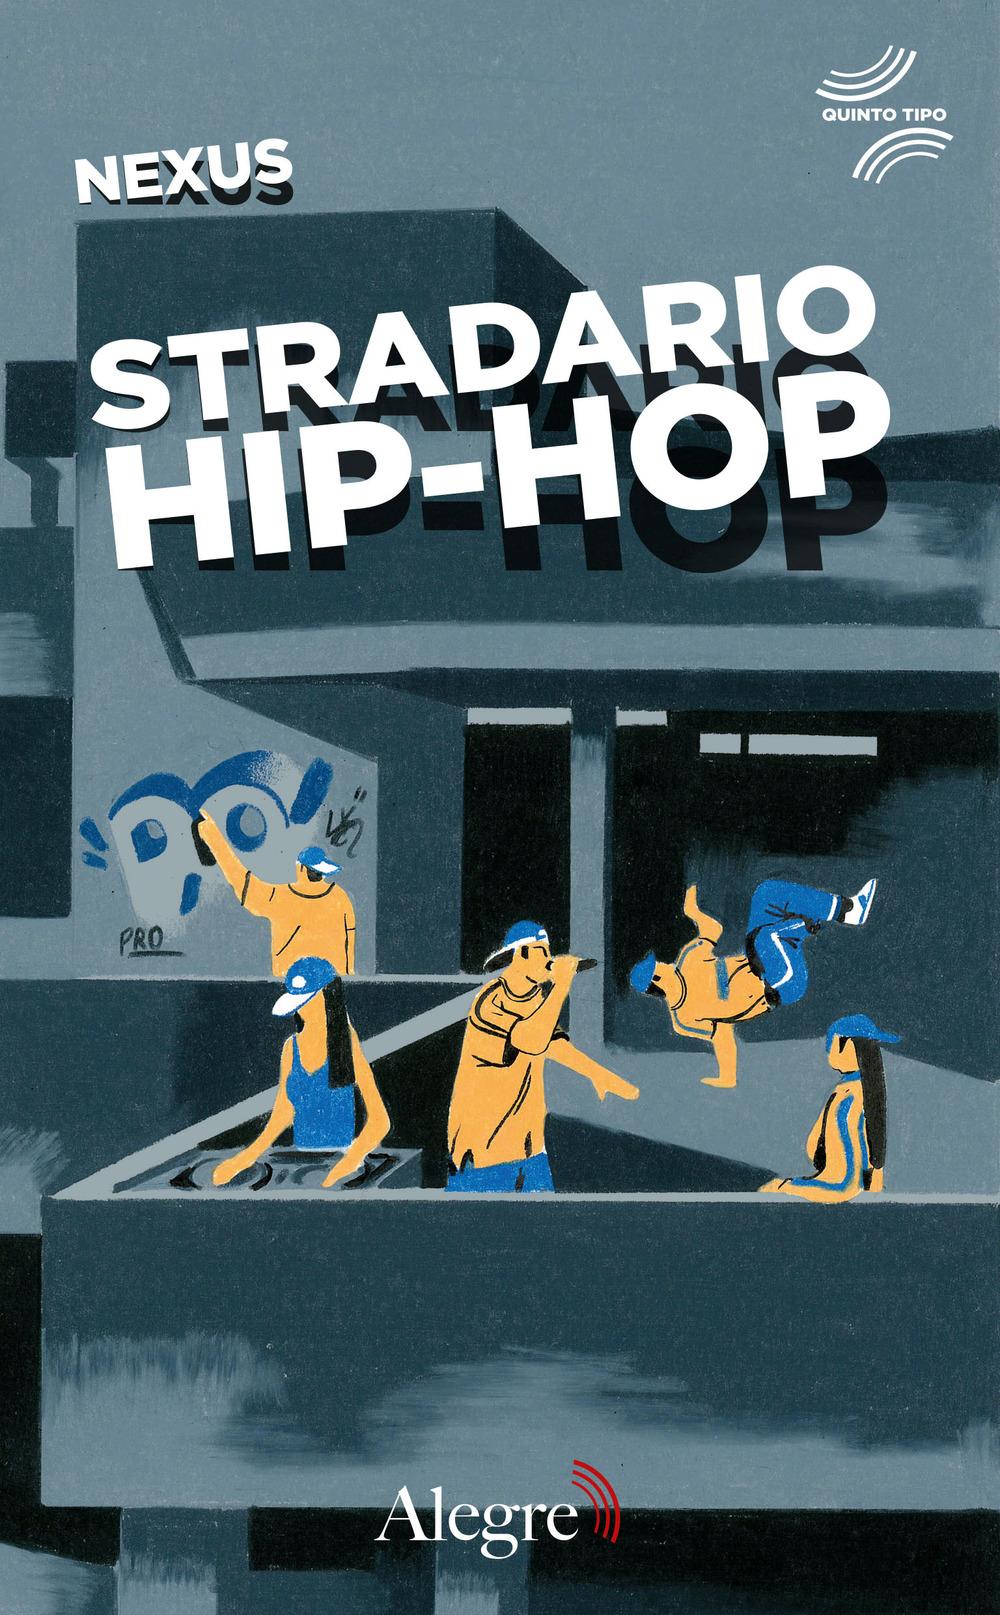 STRADARIO HIP-HOP - Nexus - 9788832067330